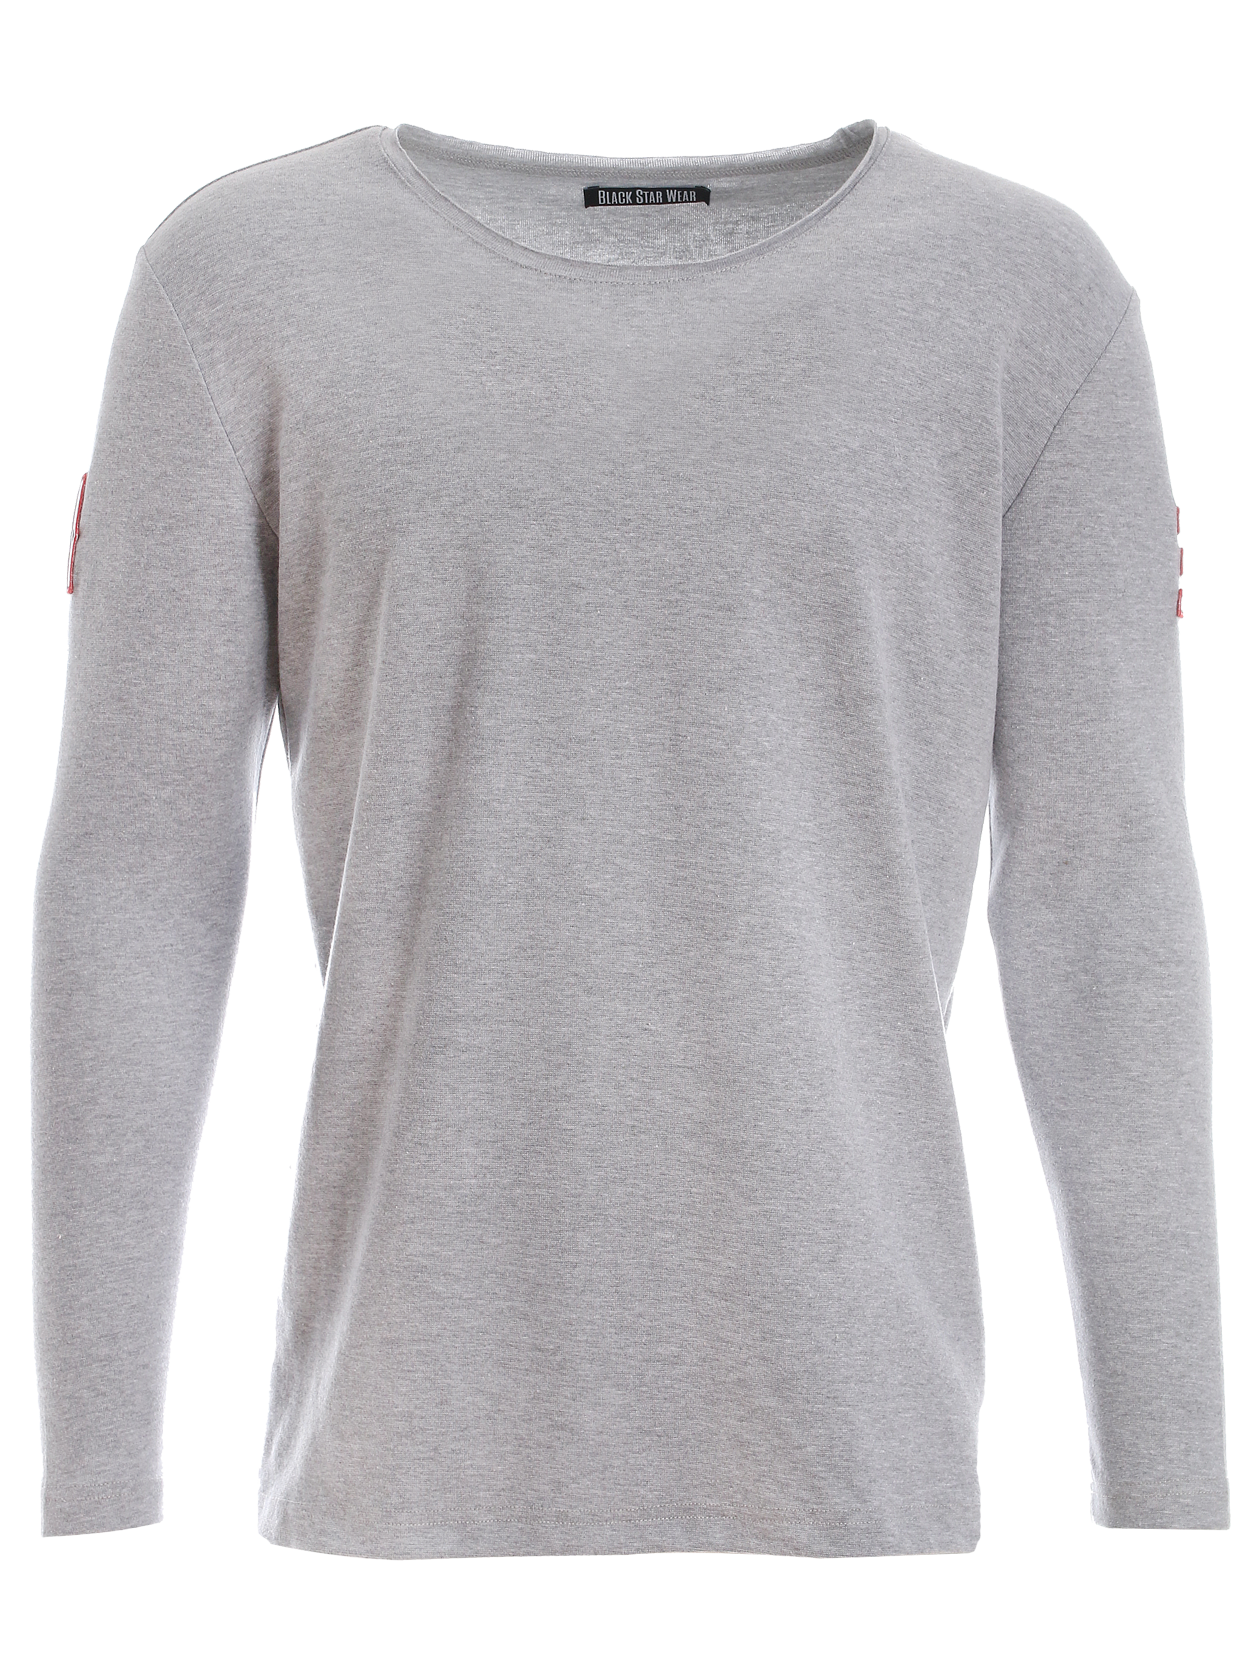 Mens long sleeve t-shirt SCOOP 13